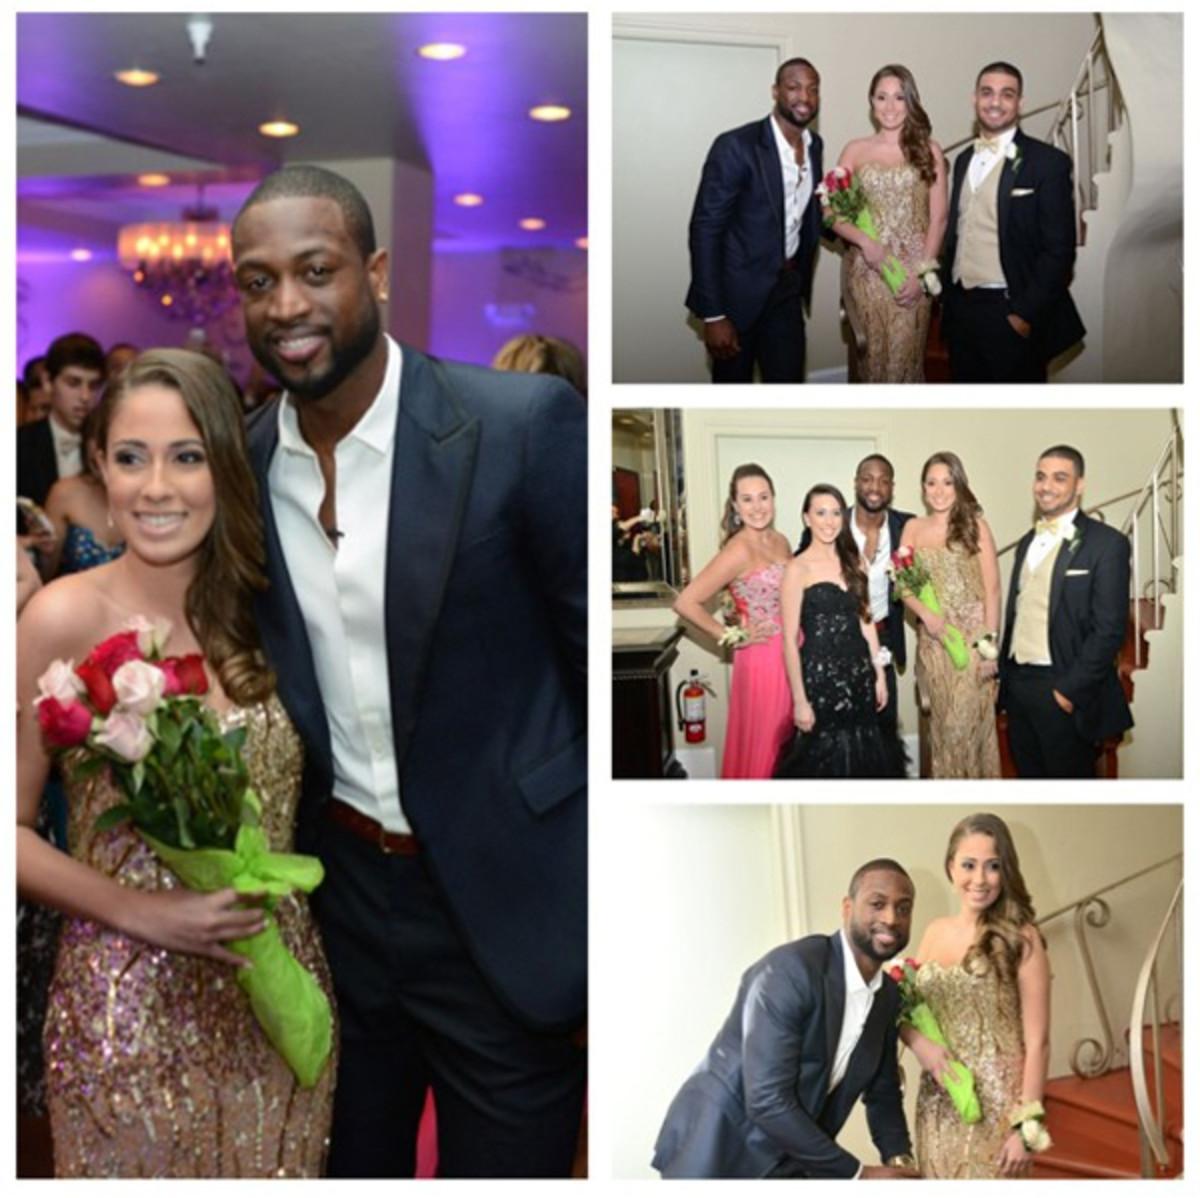 Dwyane Wade surprises a high schooler at her prom. (@dwyanewade on Instagram)